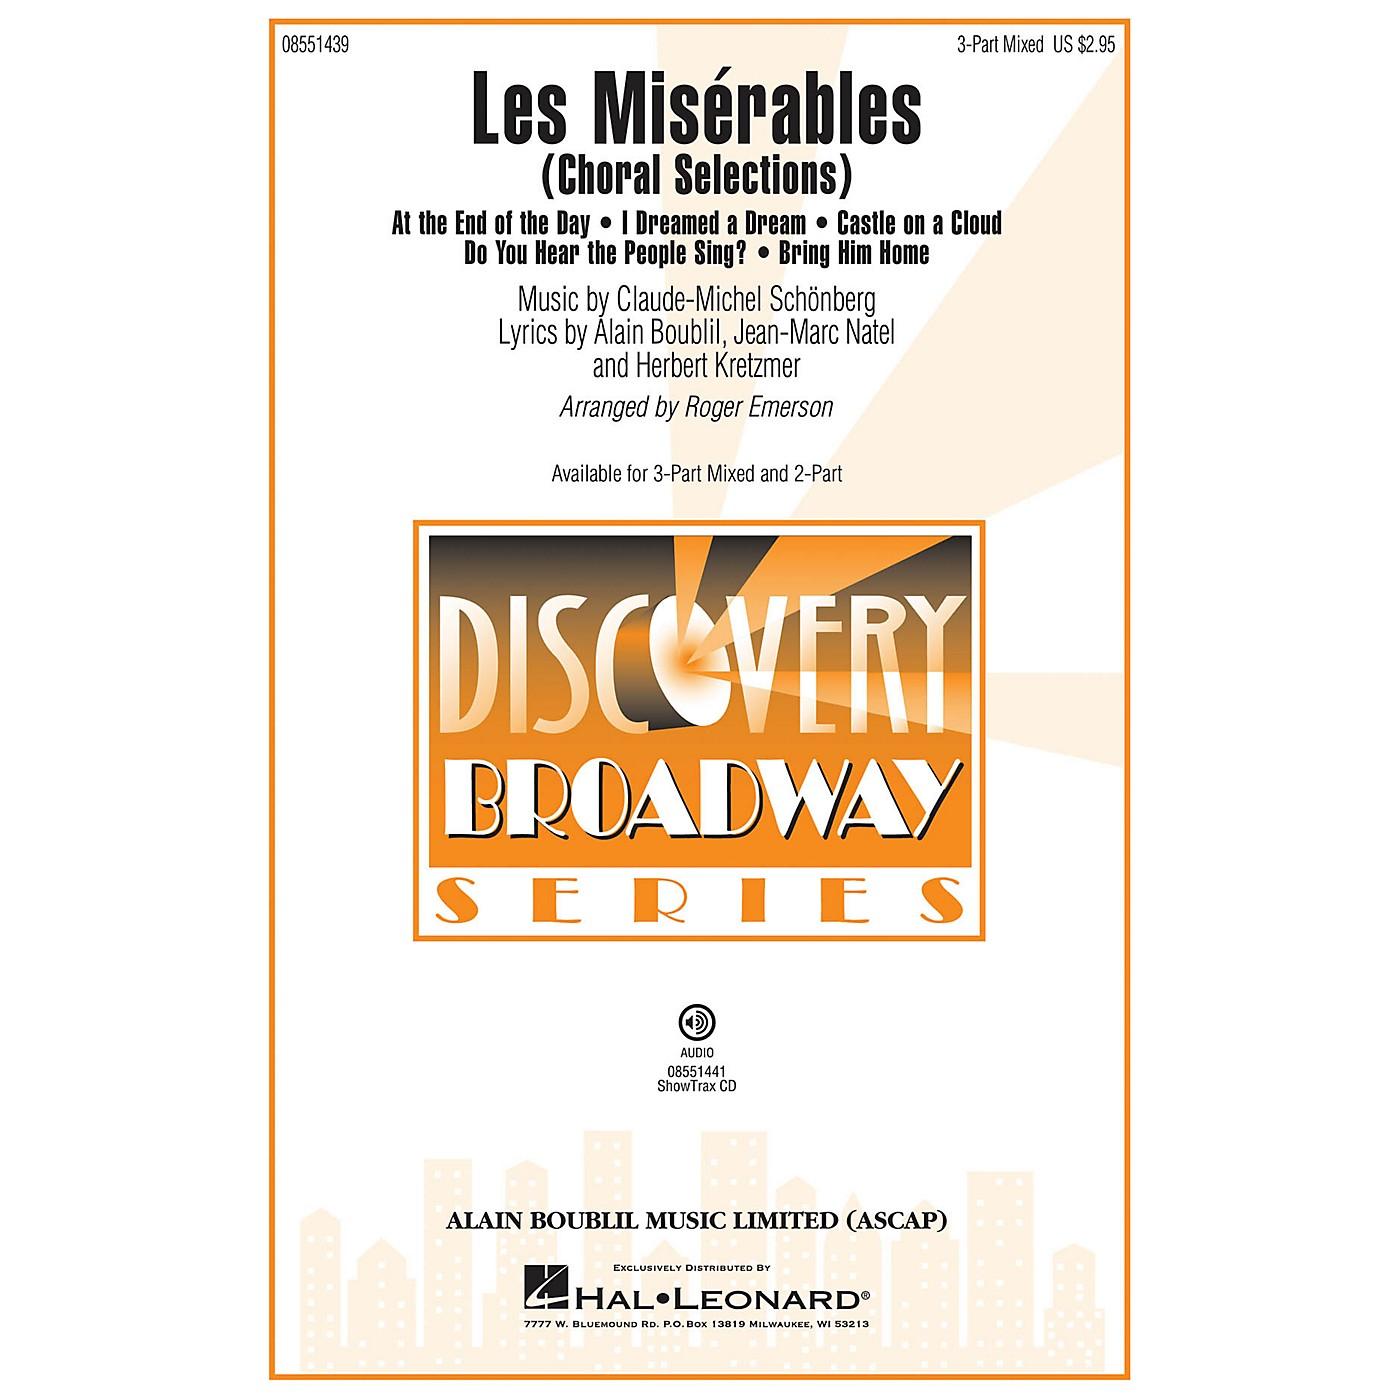 Hal Leonard Les Misérables (Choral Selections 3-Part Mixed) 3-Part Mixed arranged by Roger Emerson thumbnail